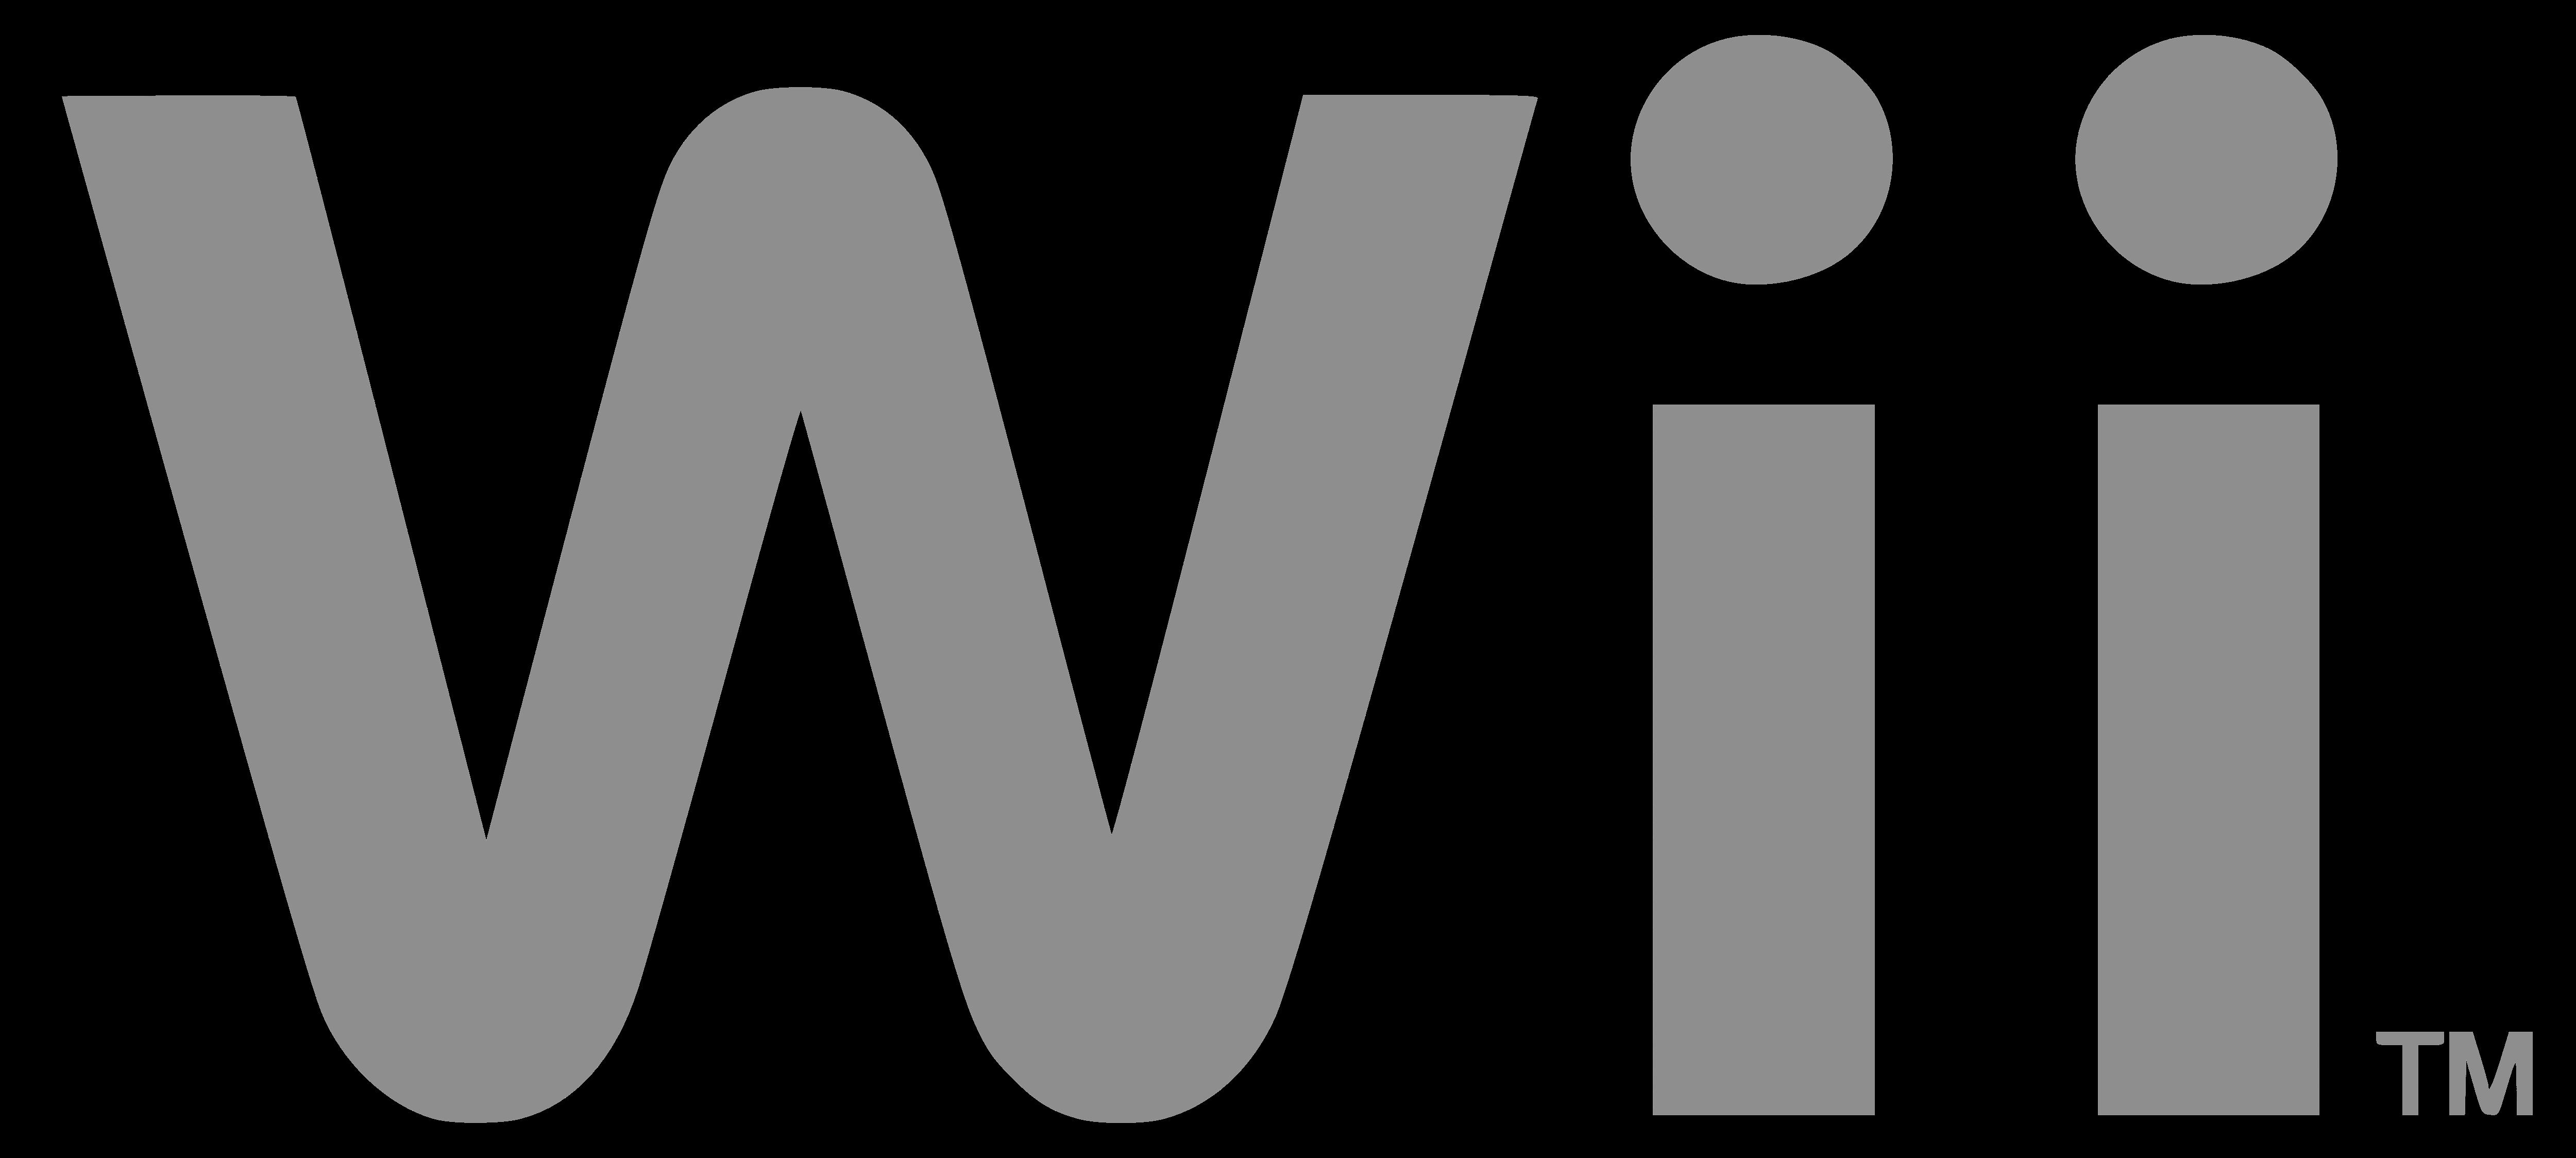 Wii Logo Png Wii – Logos Download